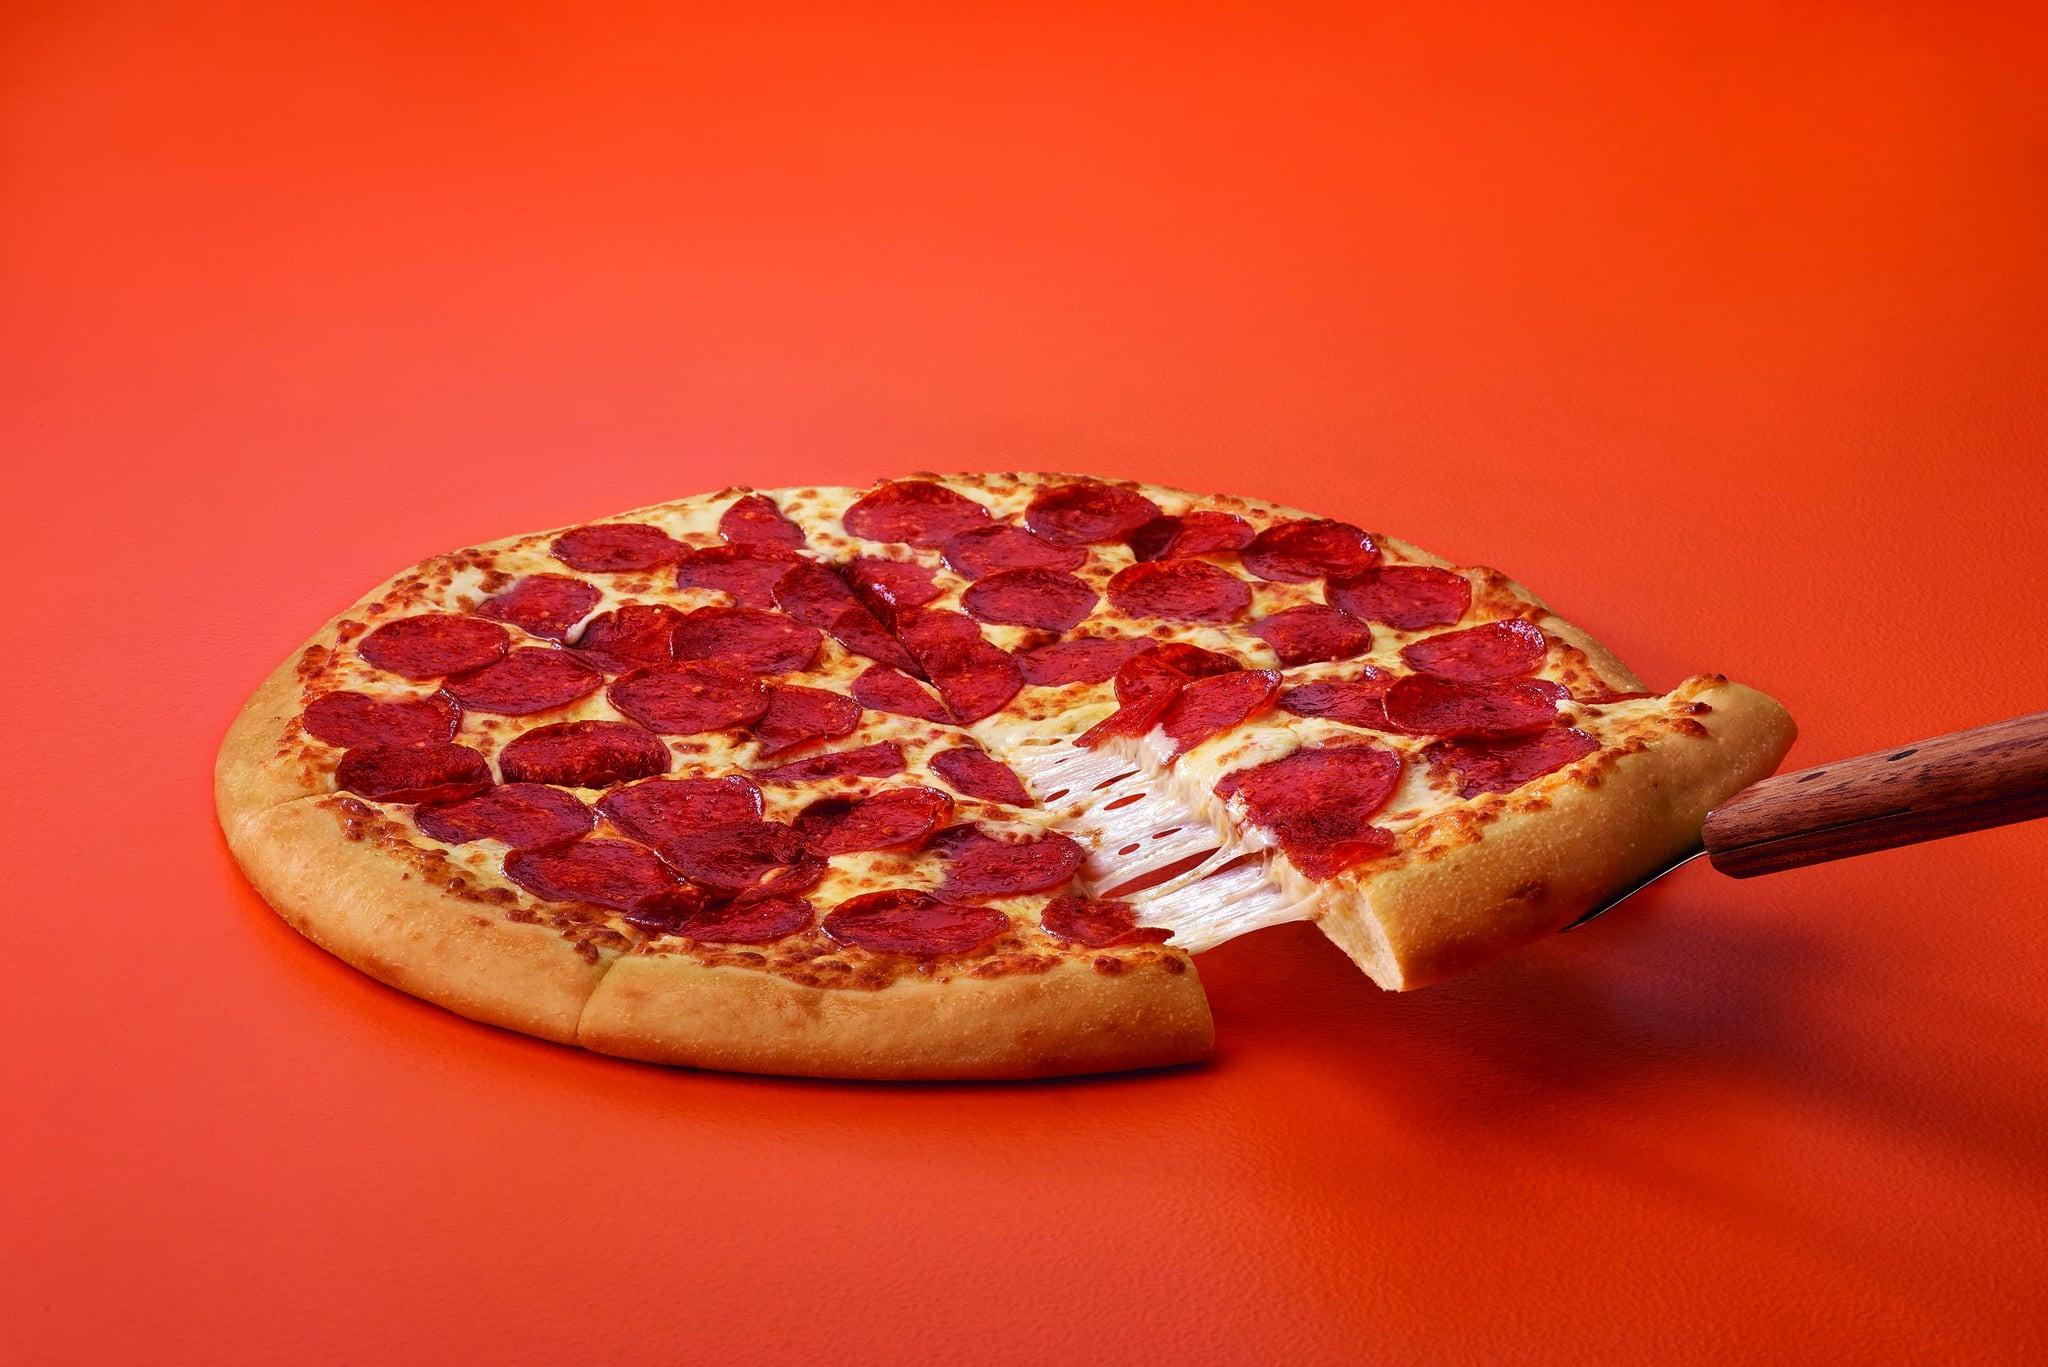 Little Caesars Hot-N-Ready Extramostbestest Pizza, Pepperoni  Little Caesars ExtraMostBestest Pizza